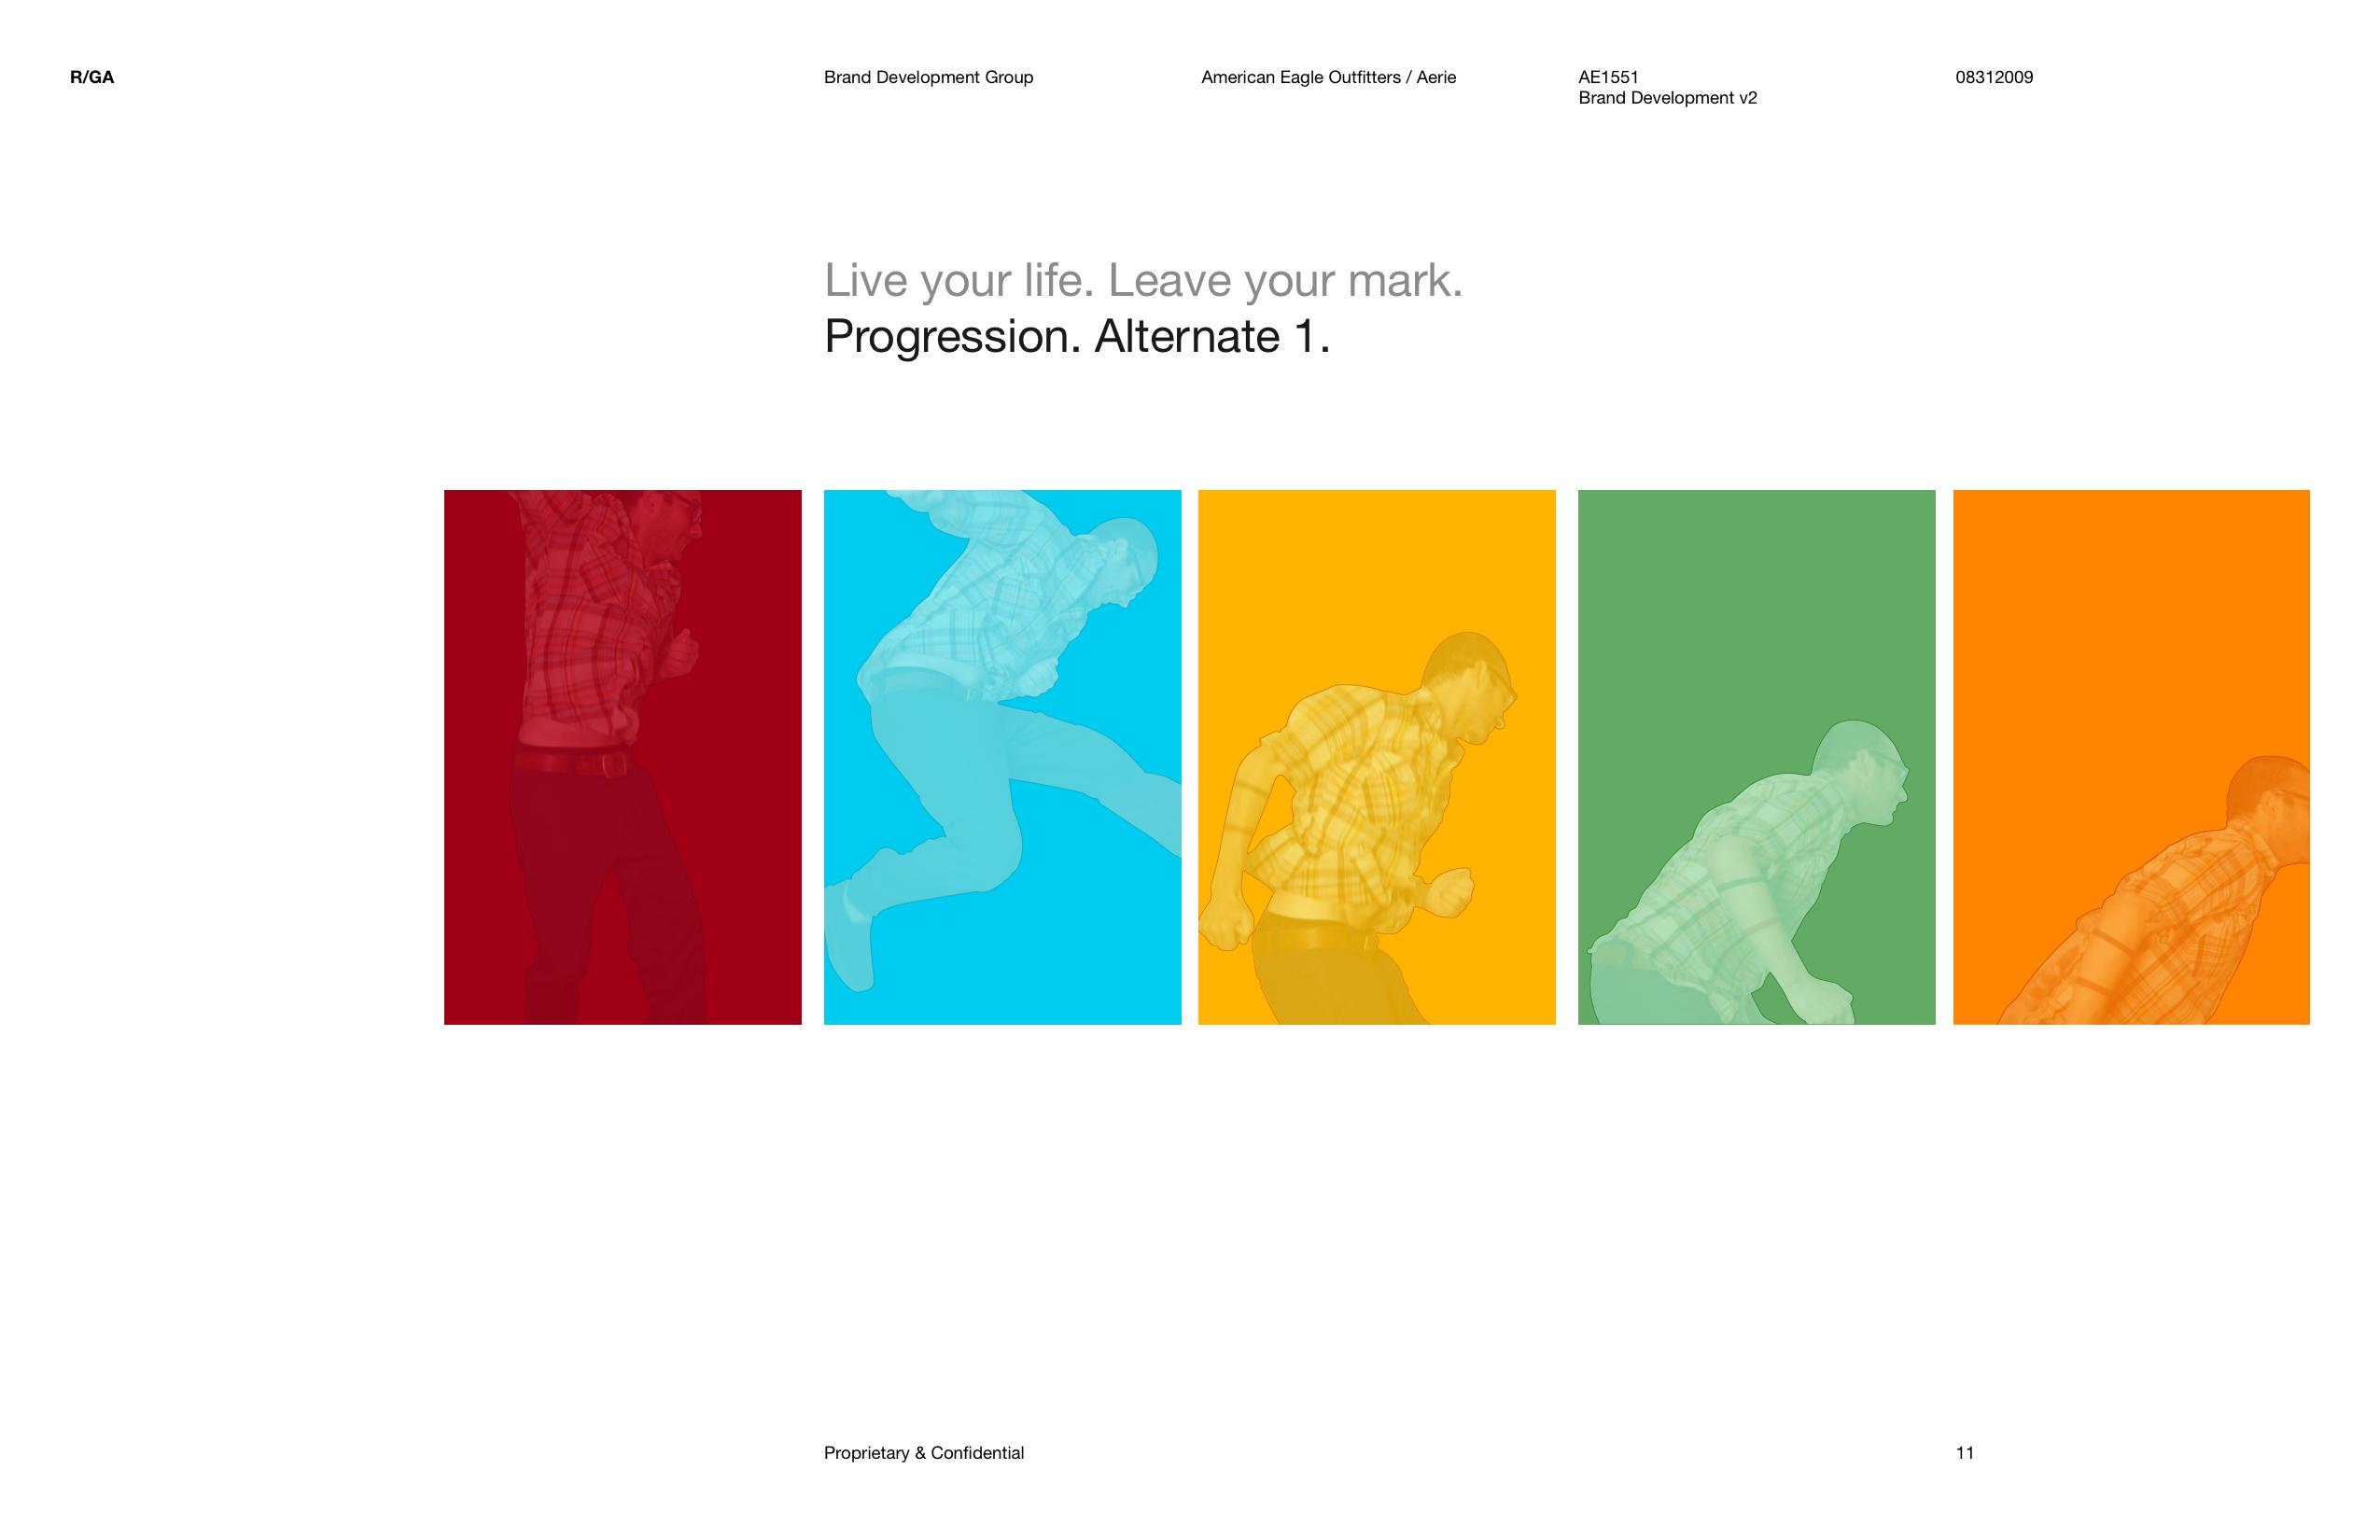 1551 Broadway / Interactive Digital Signage